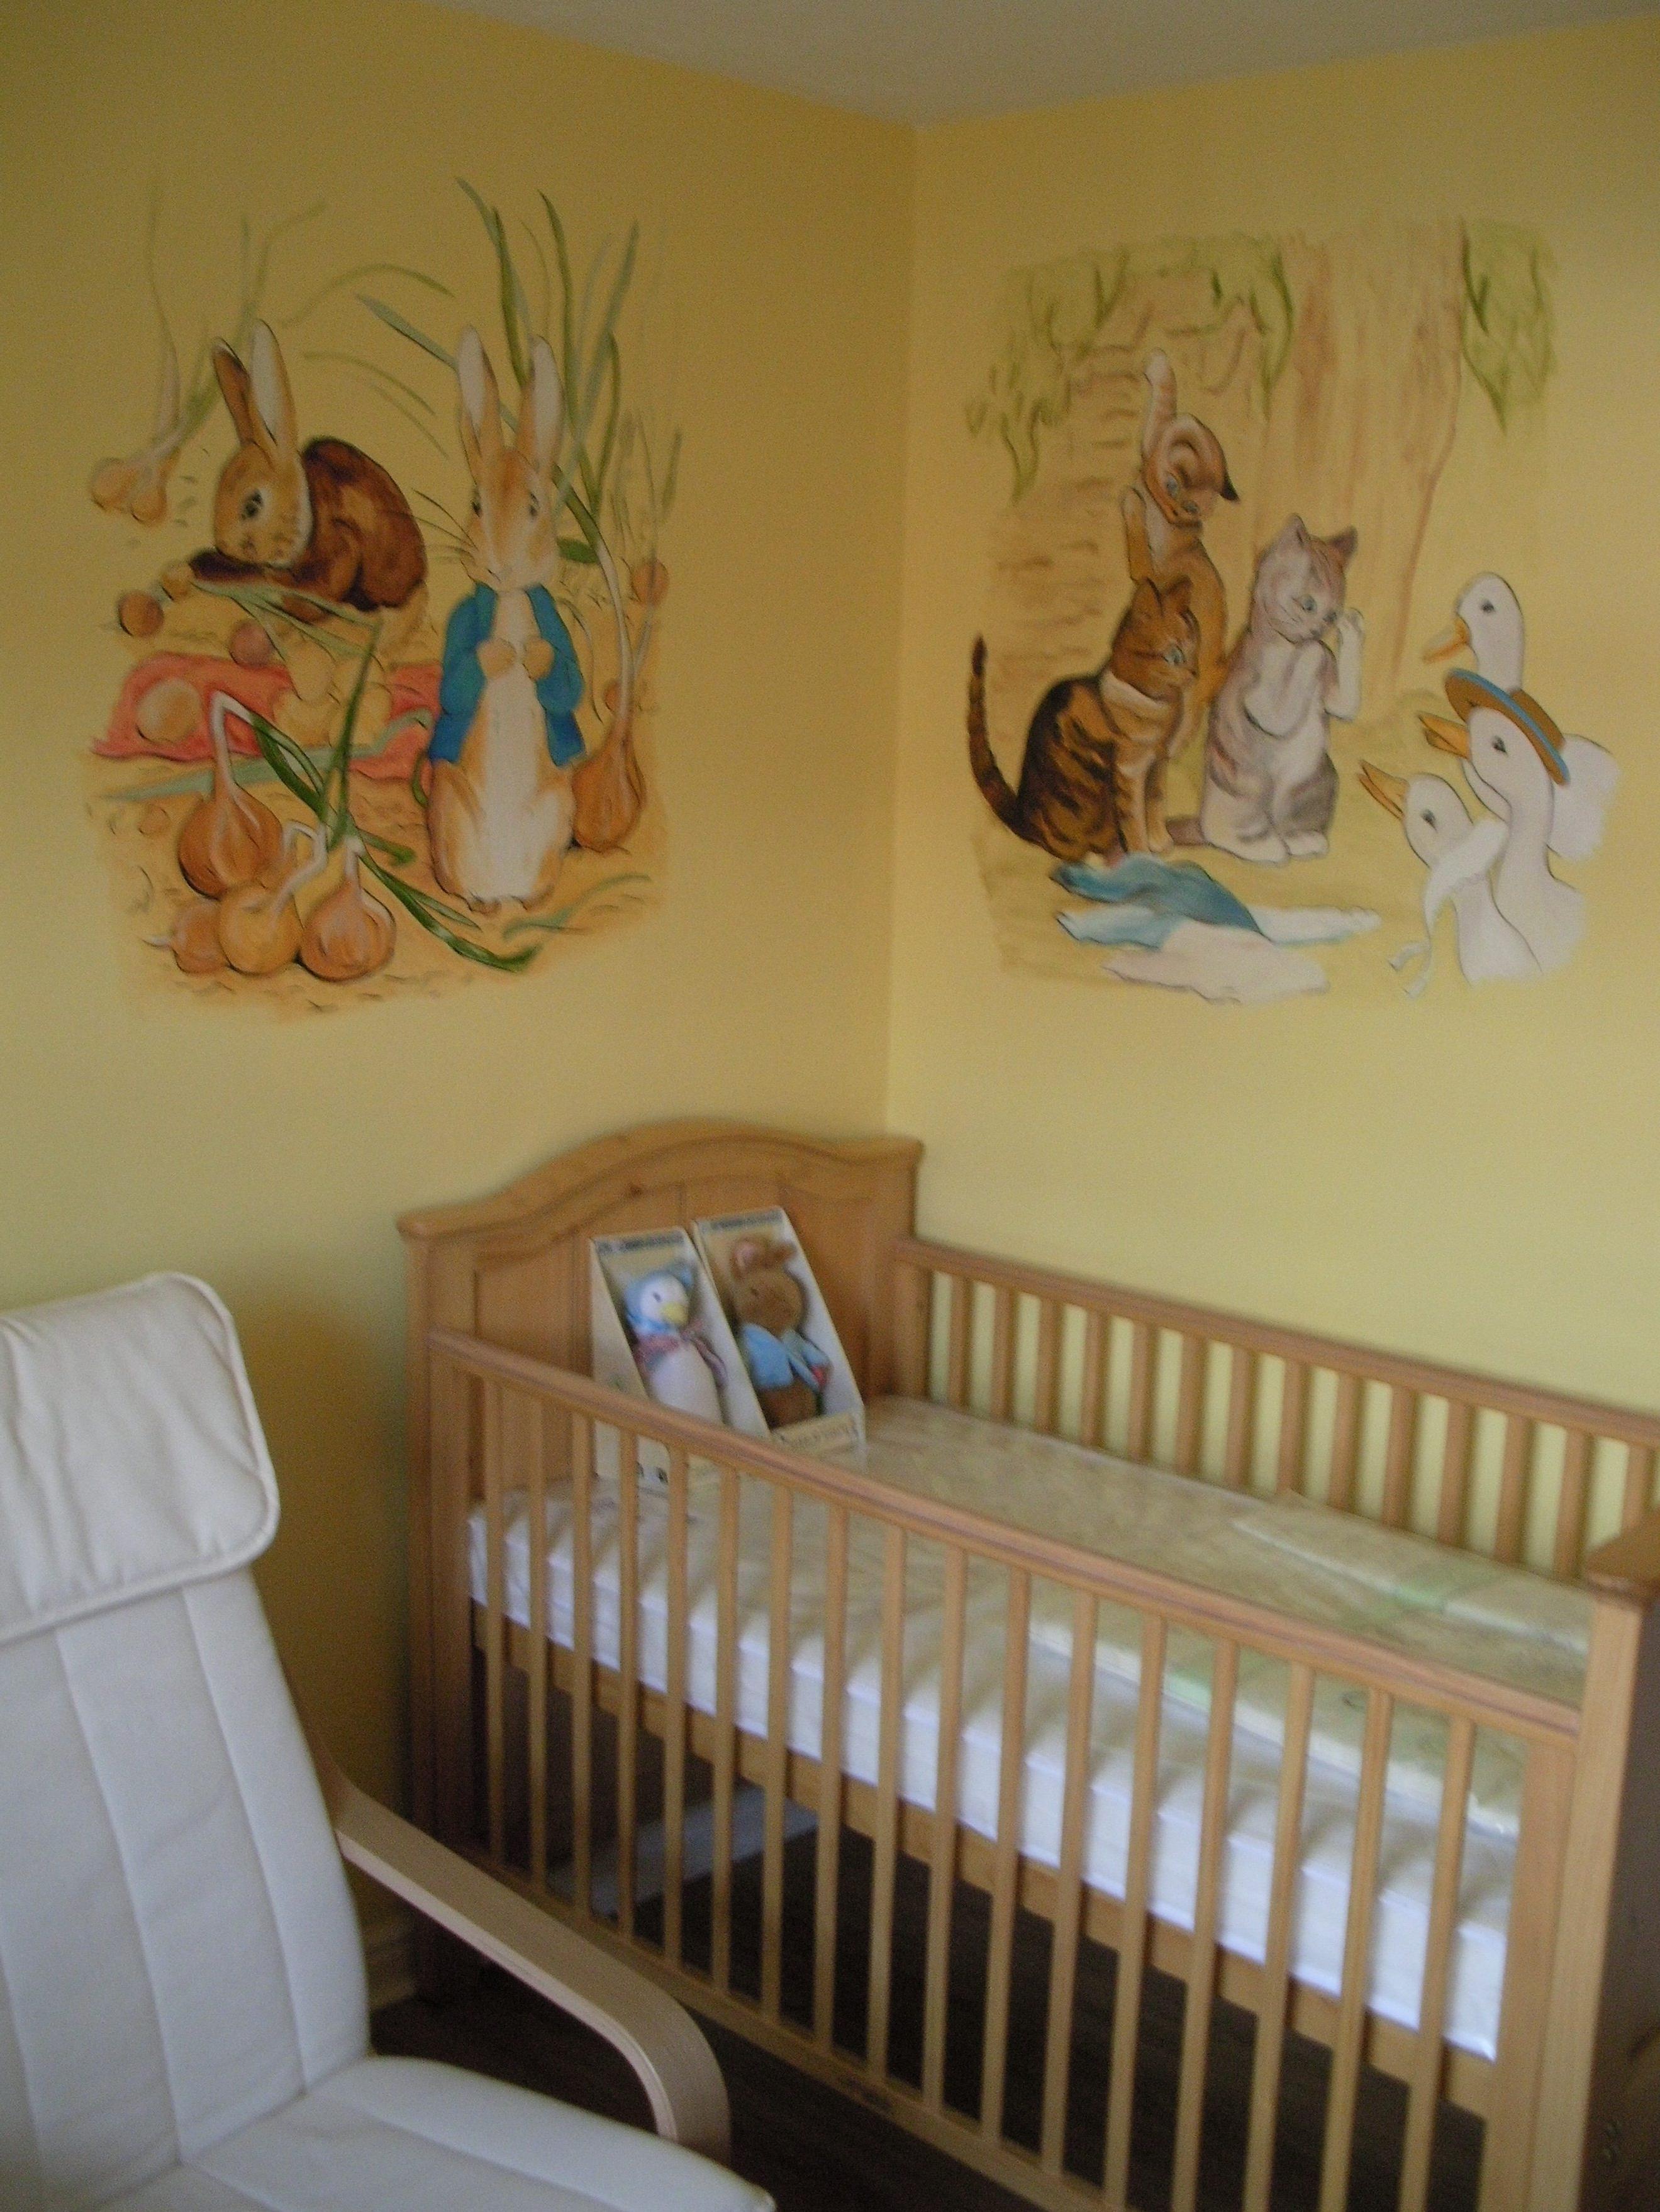 Peter Rabbit Nursery Purple — Modern Home Interiors : Peter Rabbit For Most Current Peter Rabbit Nursery Wall Art (View 8 of 15)